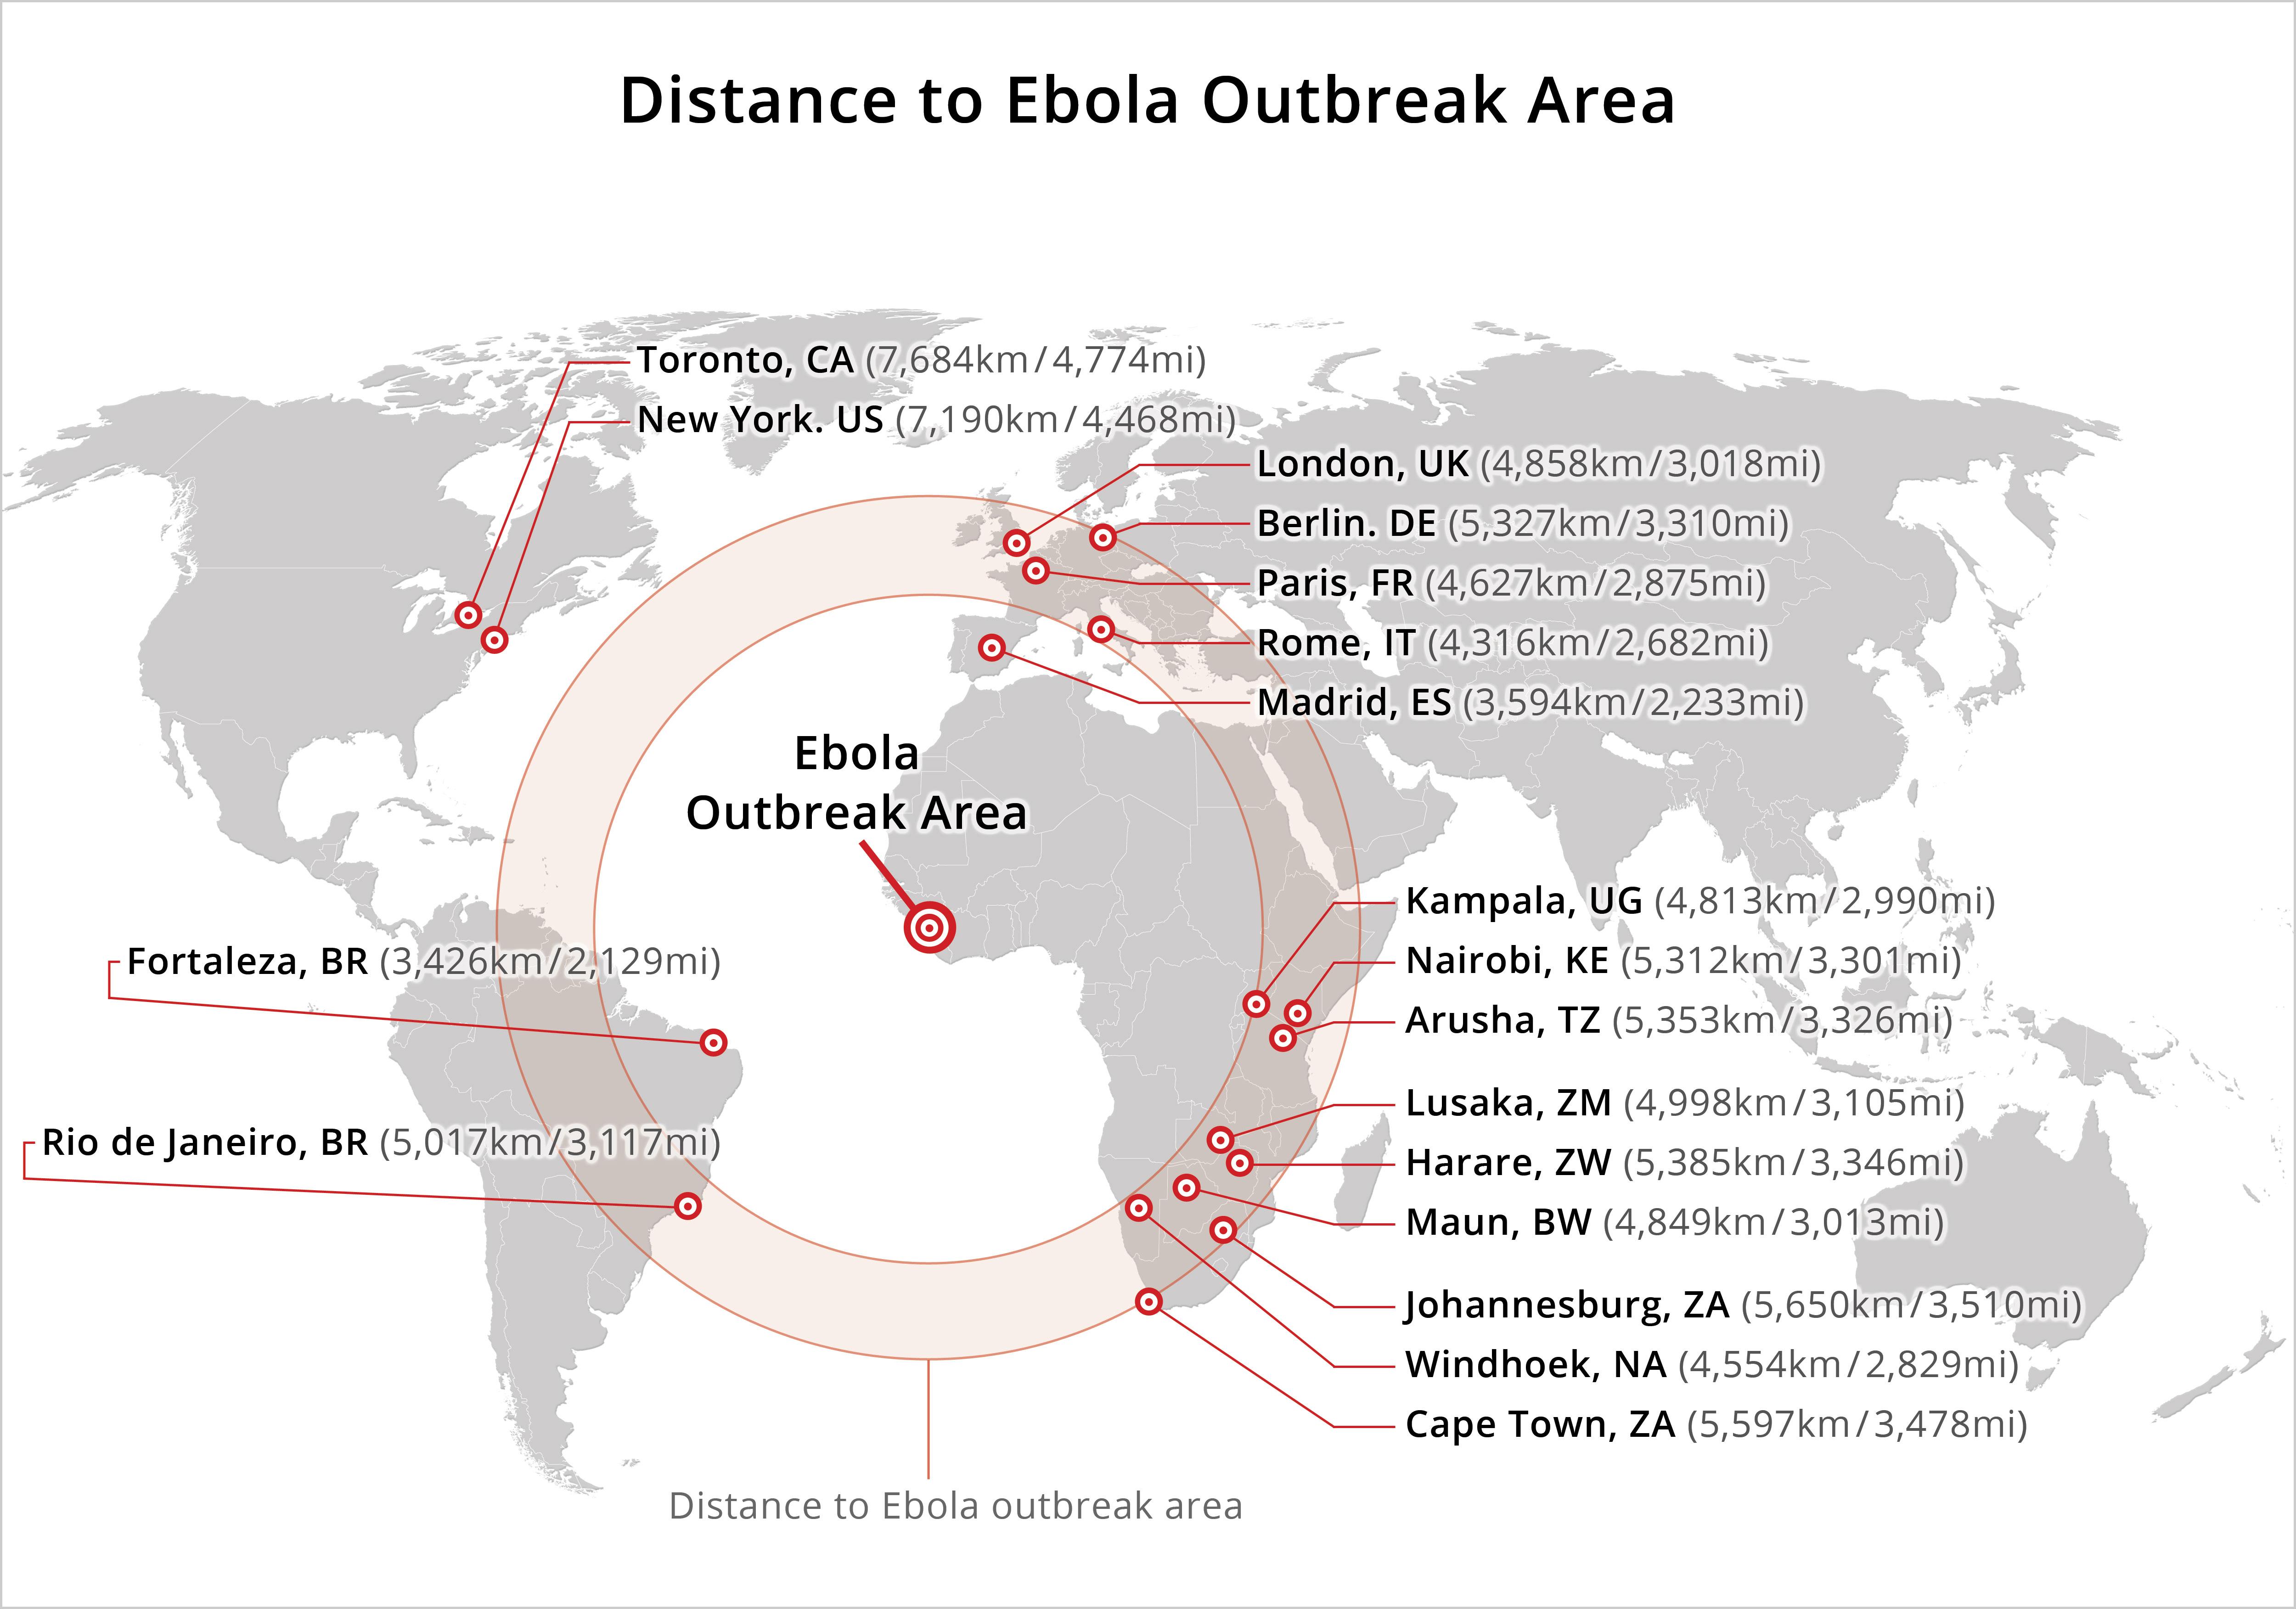 South Africa Ebola Outbreak